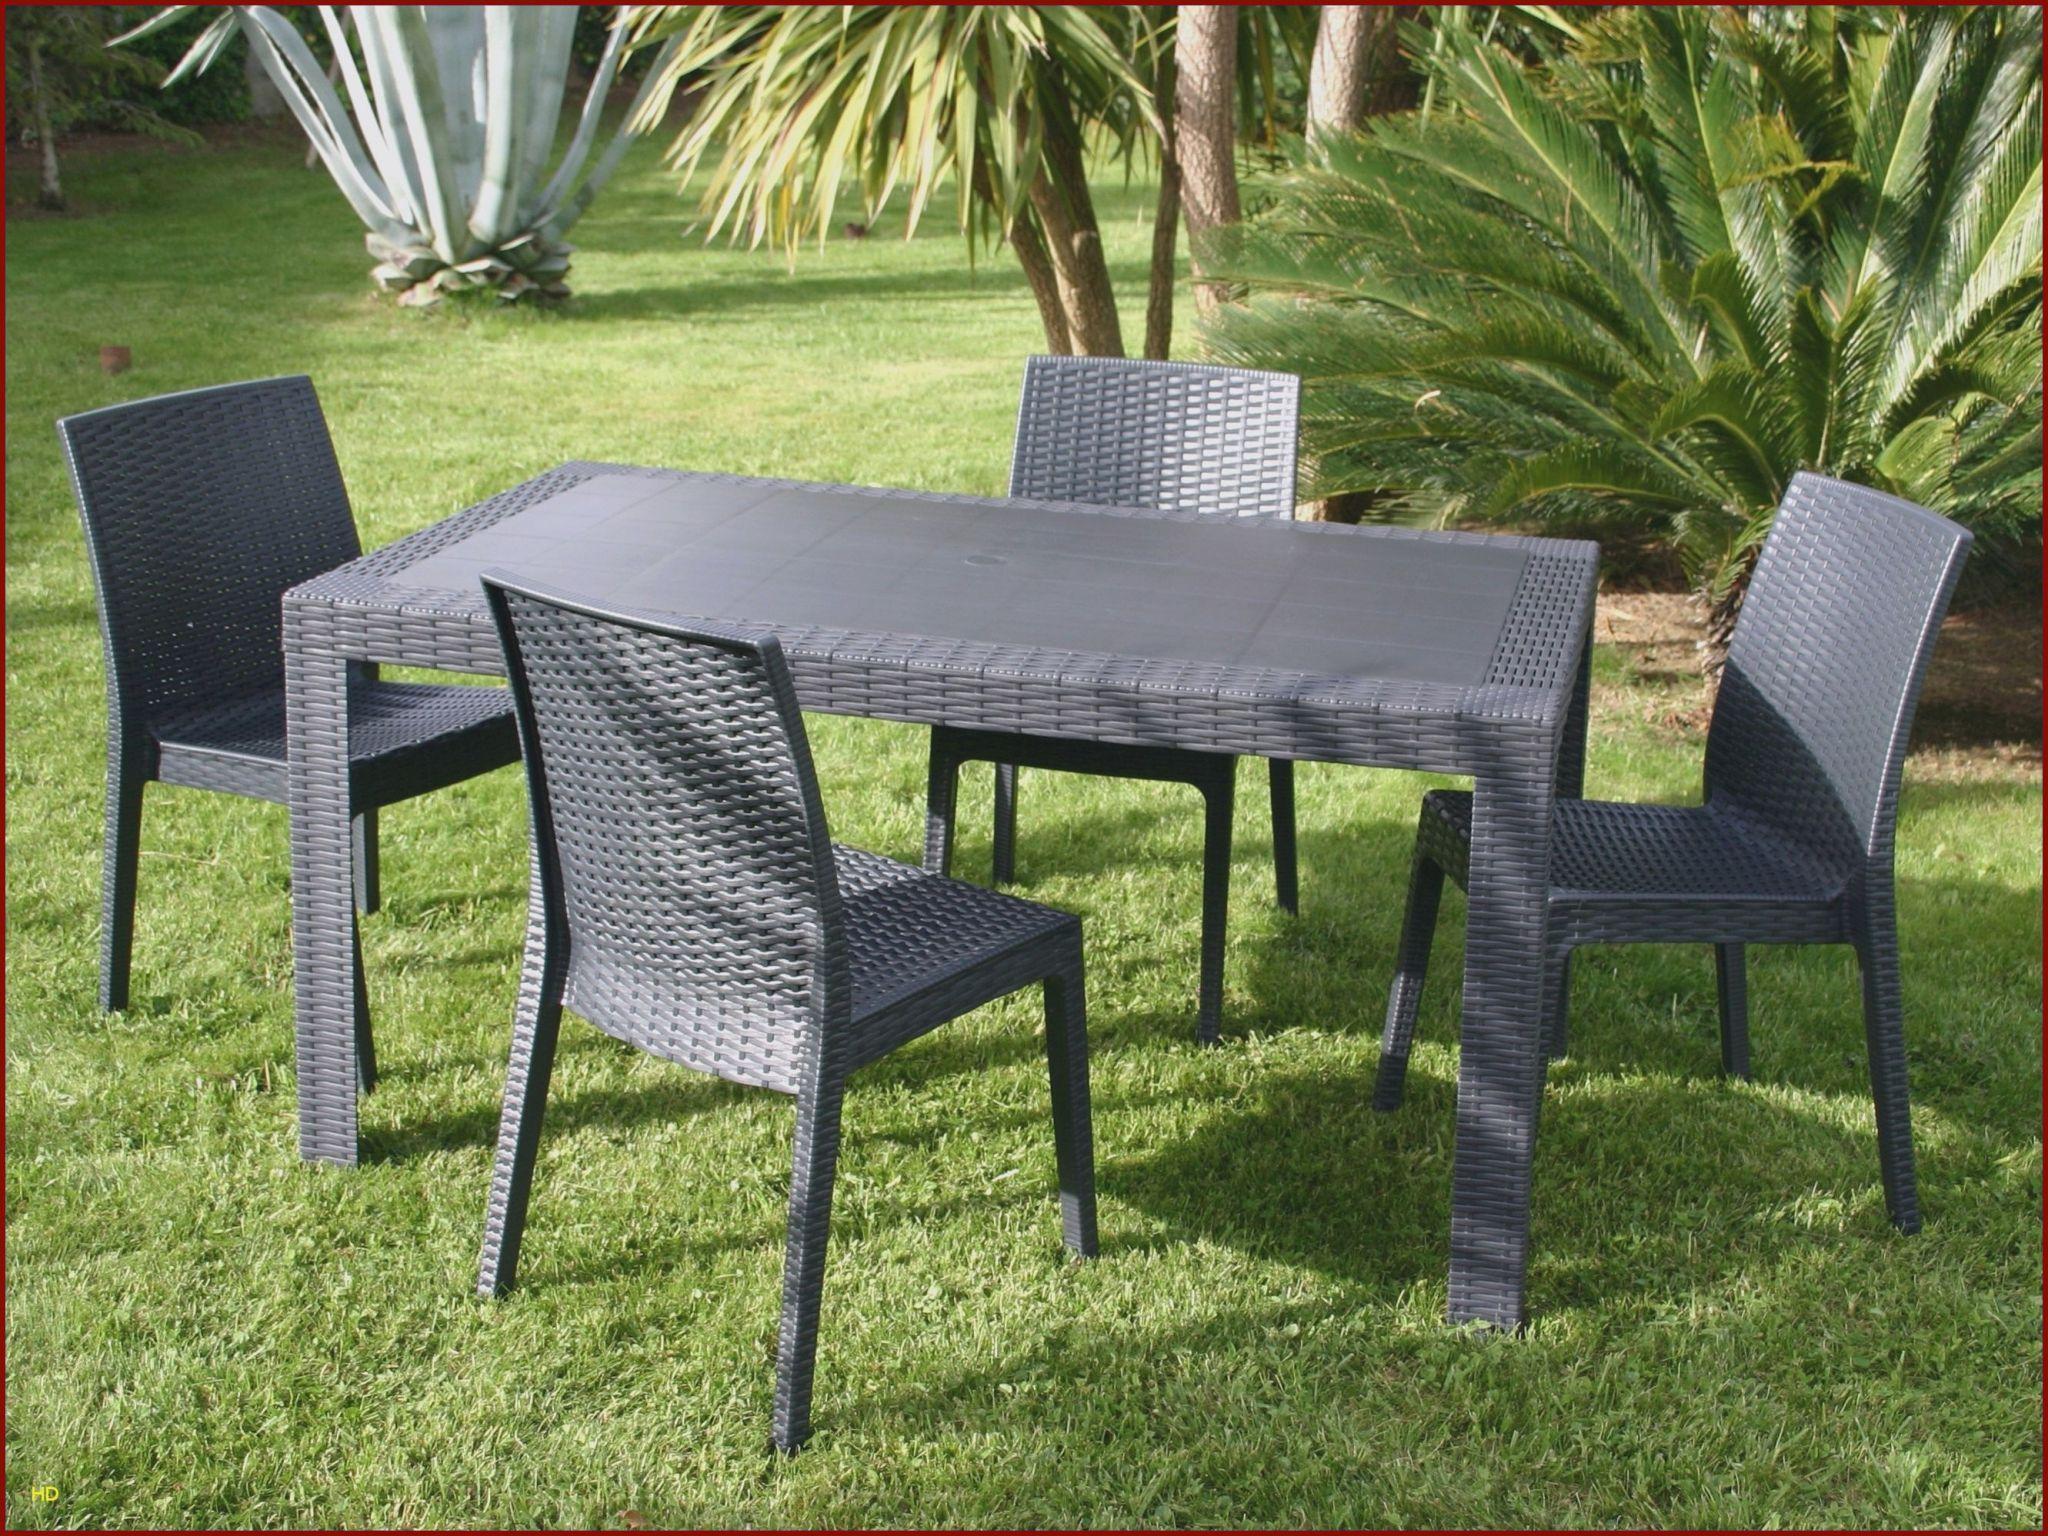 Table Et Chaise En Bois Inspirant Chaises Luxe Chaise Ice 0d Table Jardin Resine Lovely Of 33 Best Of Table Et Chaise En Bois